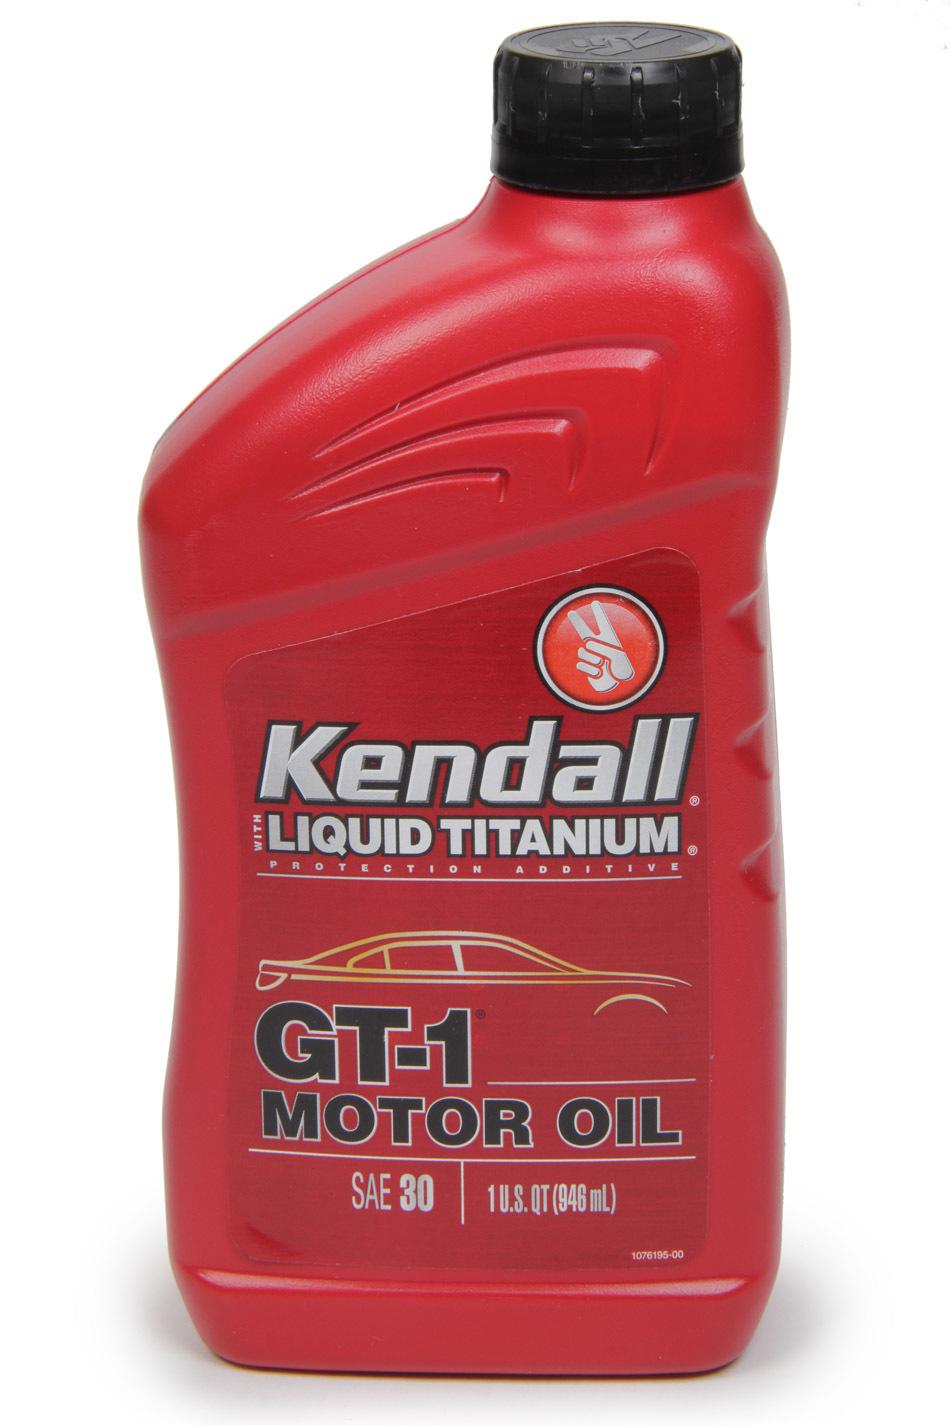 Kendall Oil 1074971 Motor Oil, GT-1 High Performance, 30W, Semi-Synthetic, 1 qt Bottle, Each